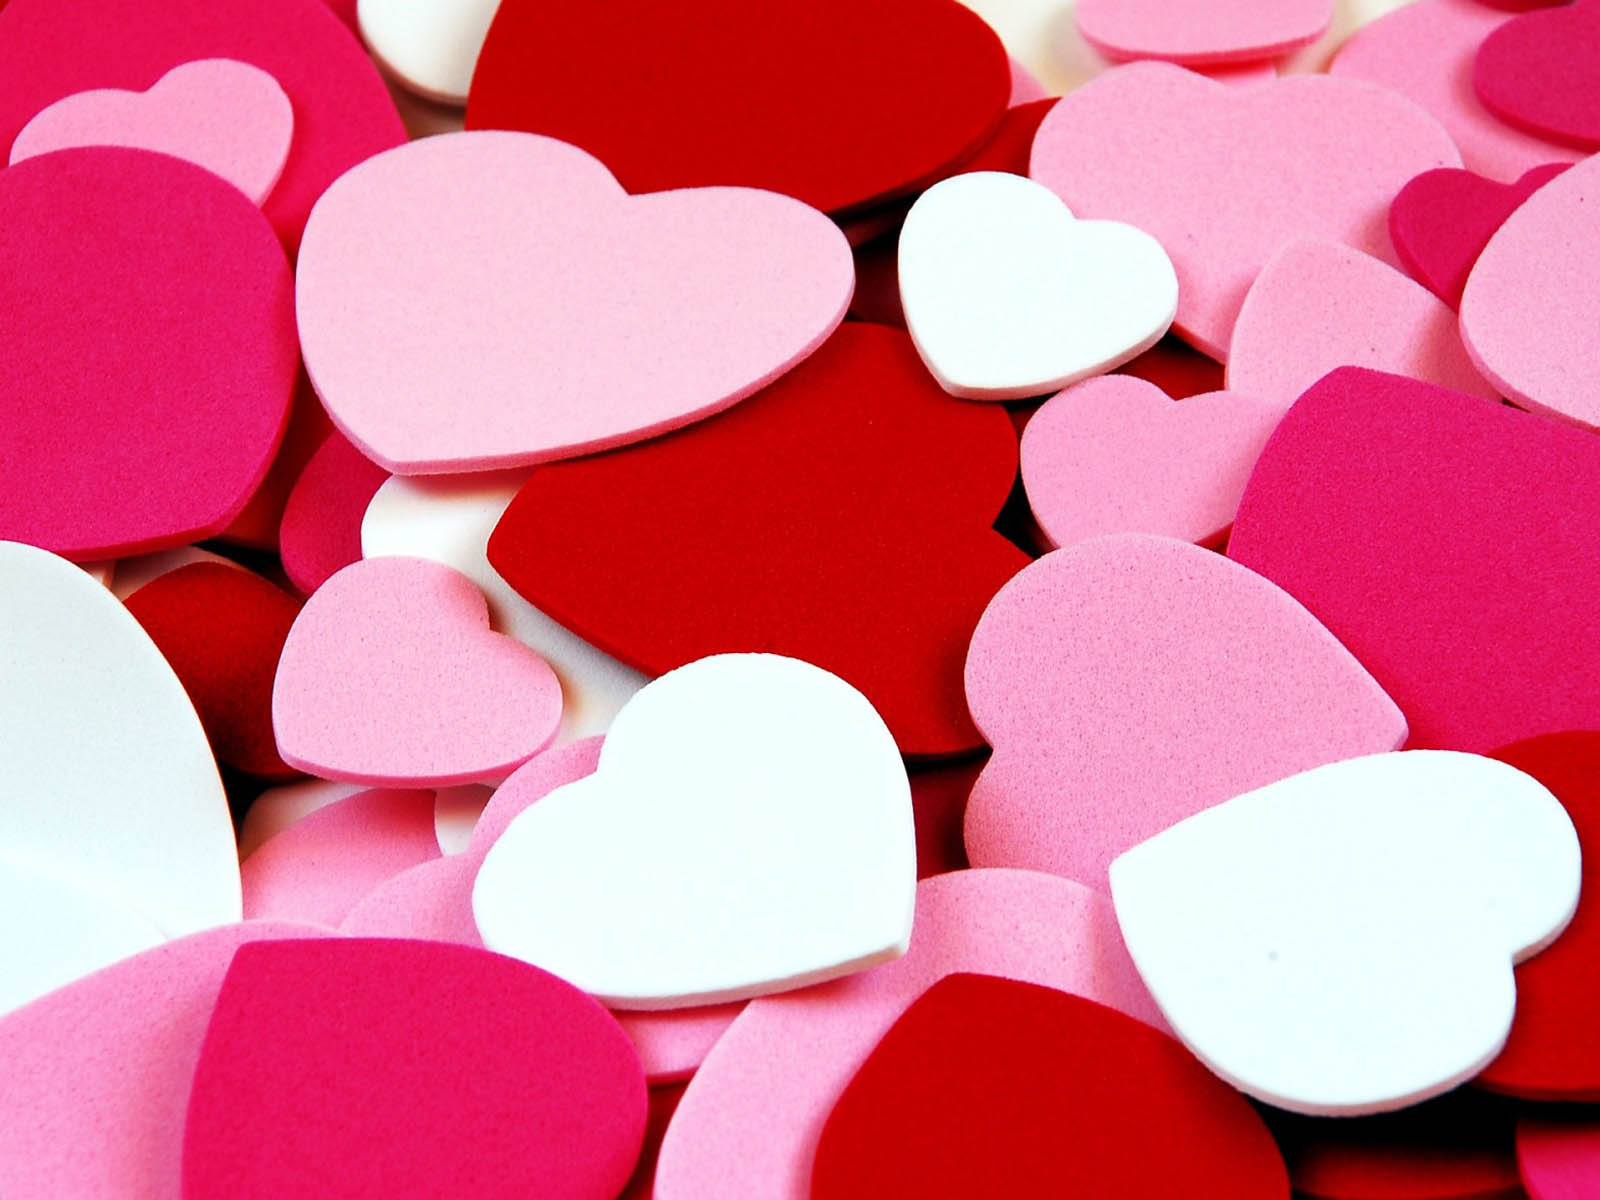 wallpapers: Heart Love Wallpapers